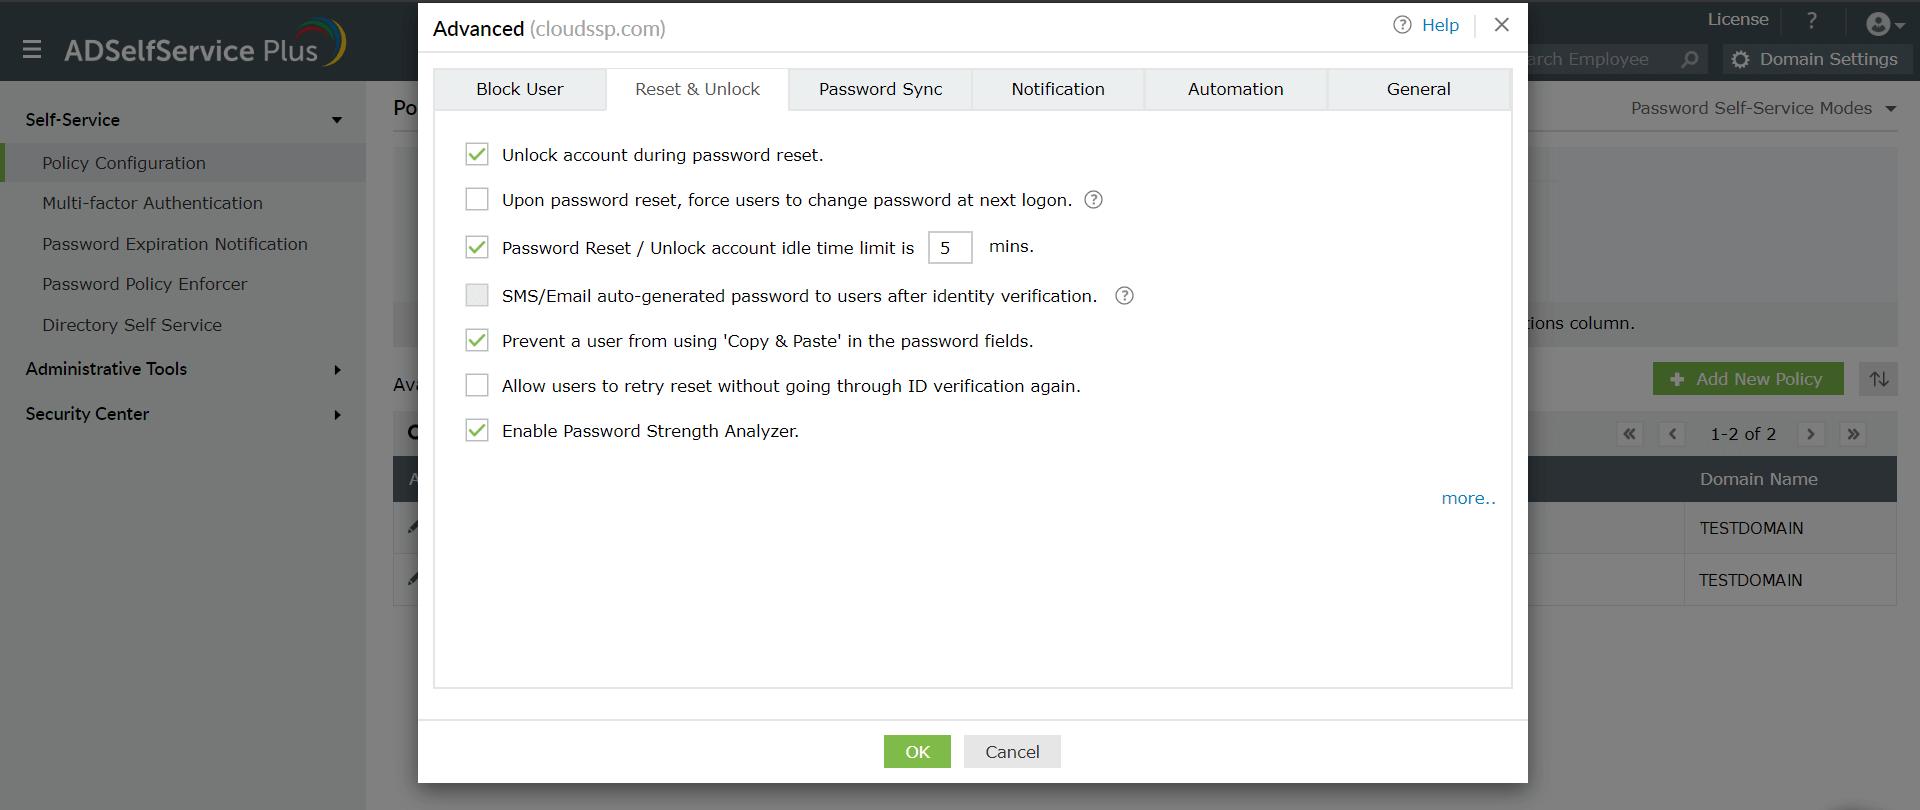 adselfservice-plus-advanced-password-reset-policy